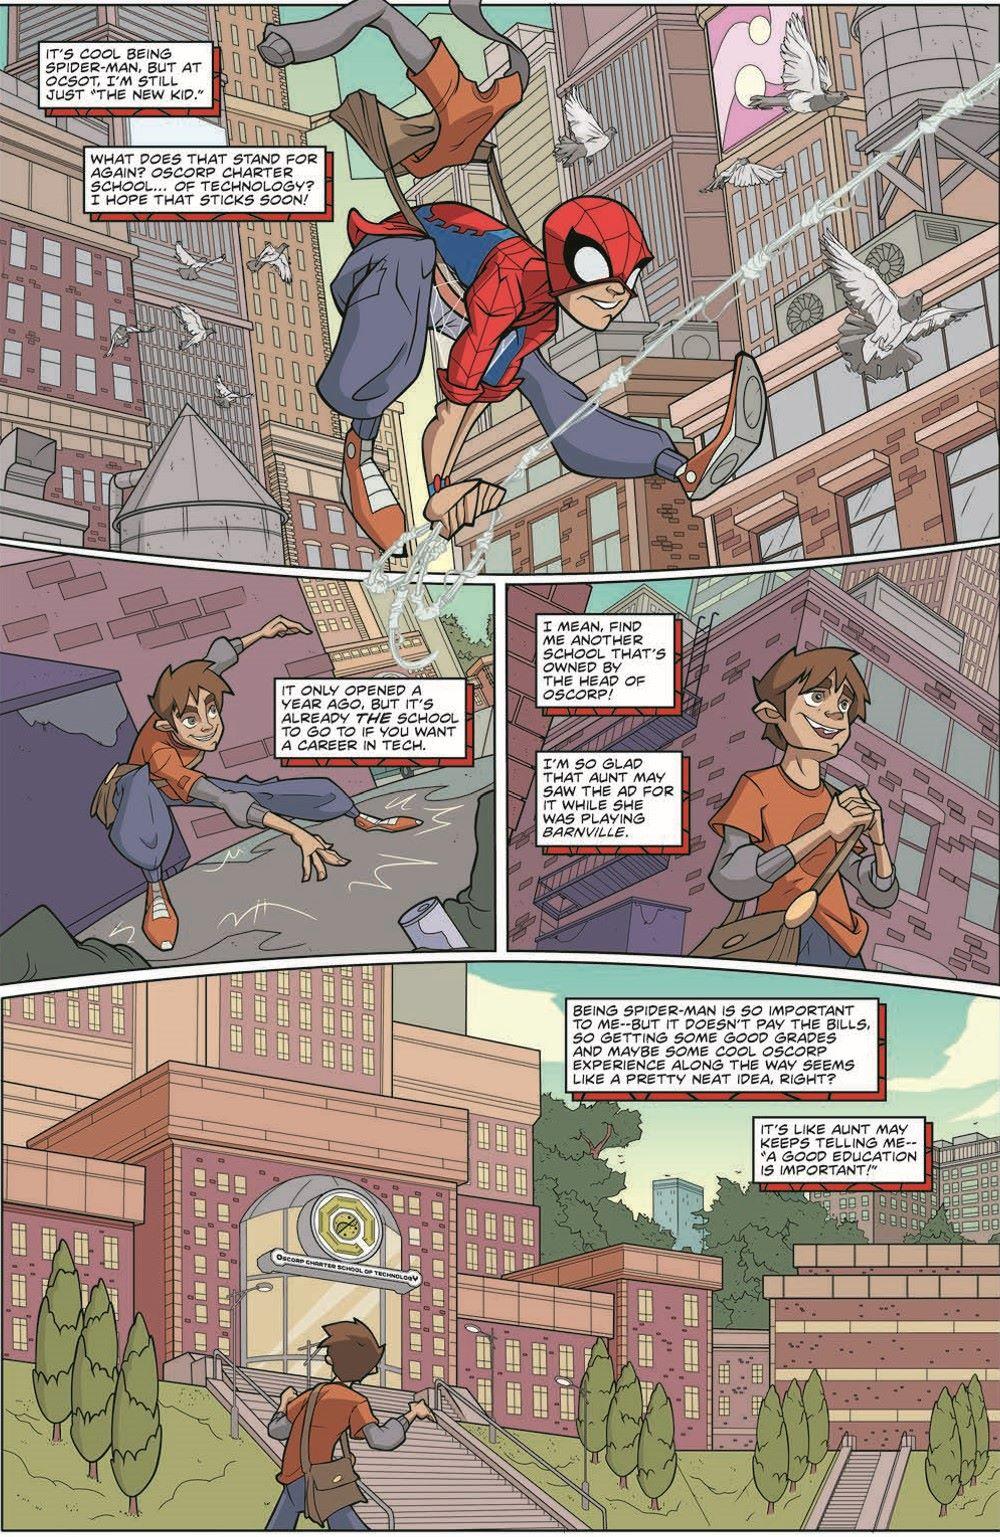 SpidermanV3-01_pr-6 ComicList Previews: MARVEL ACTION SPIDER-MAN VOLUME 3 #1